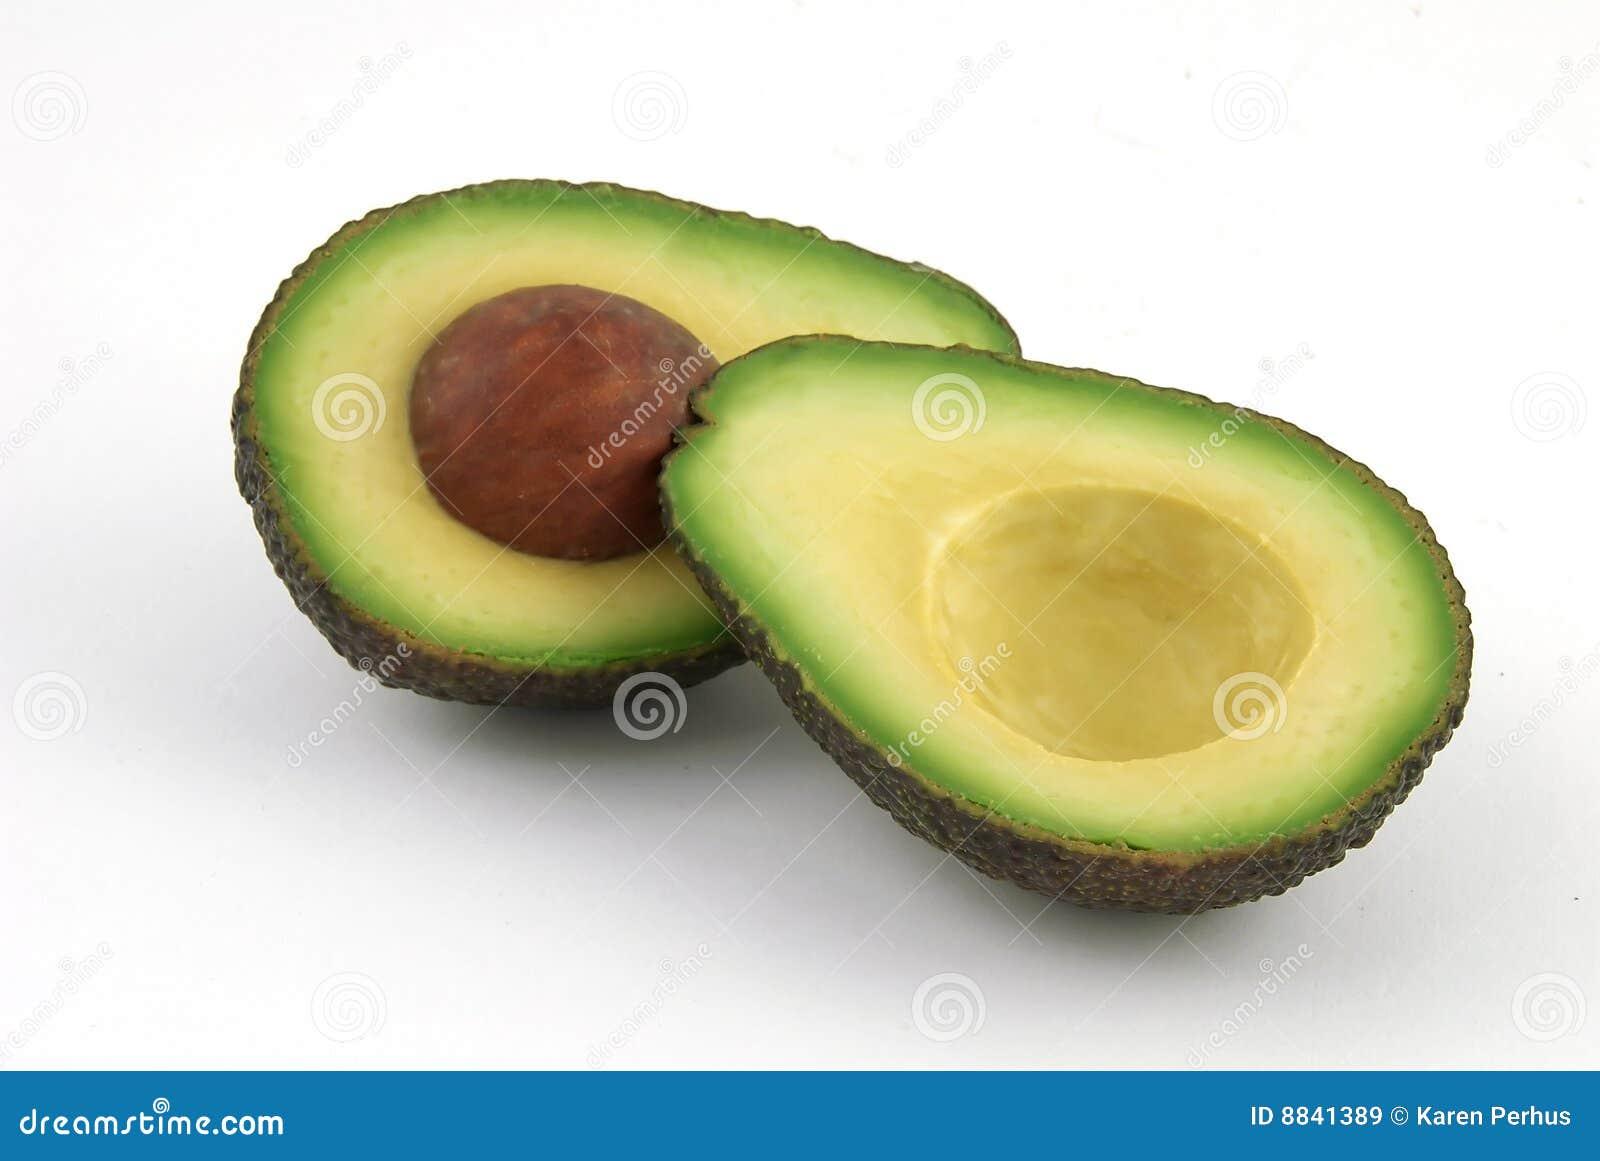 how to store half cut avocado